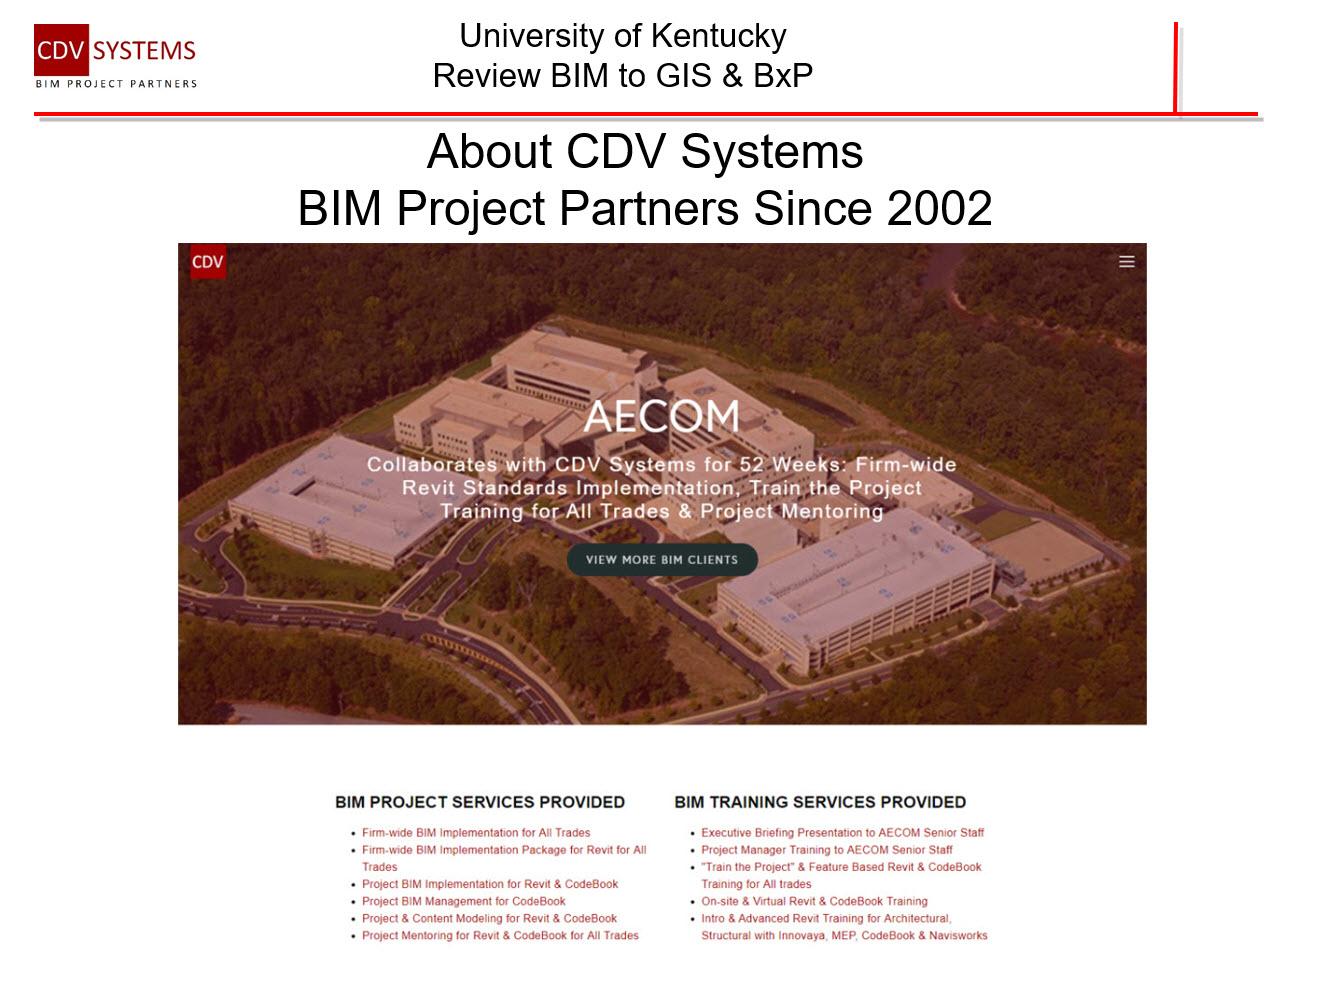 University of Kentucky_001f.jpg